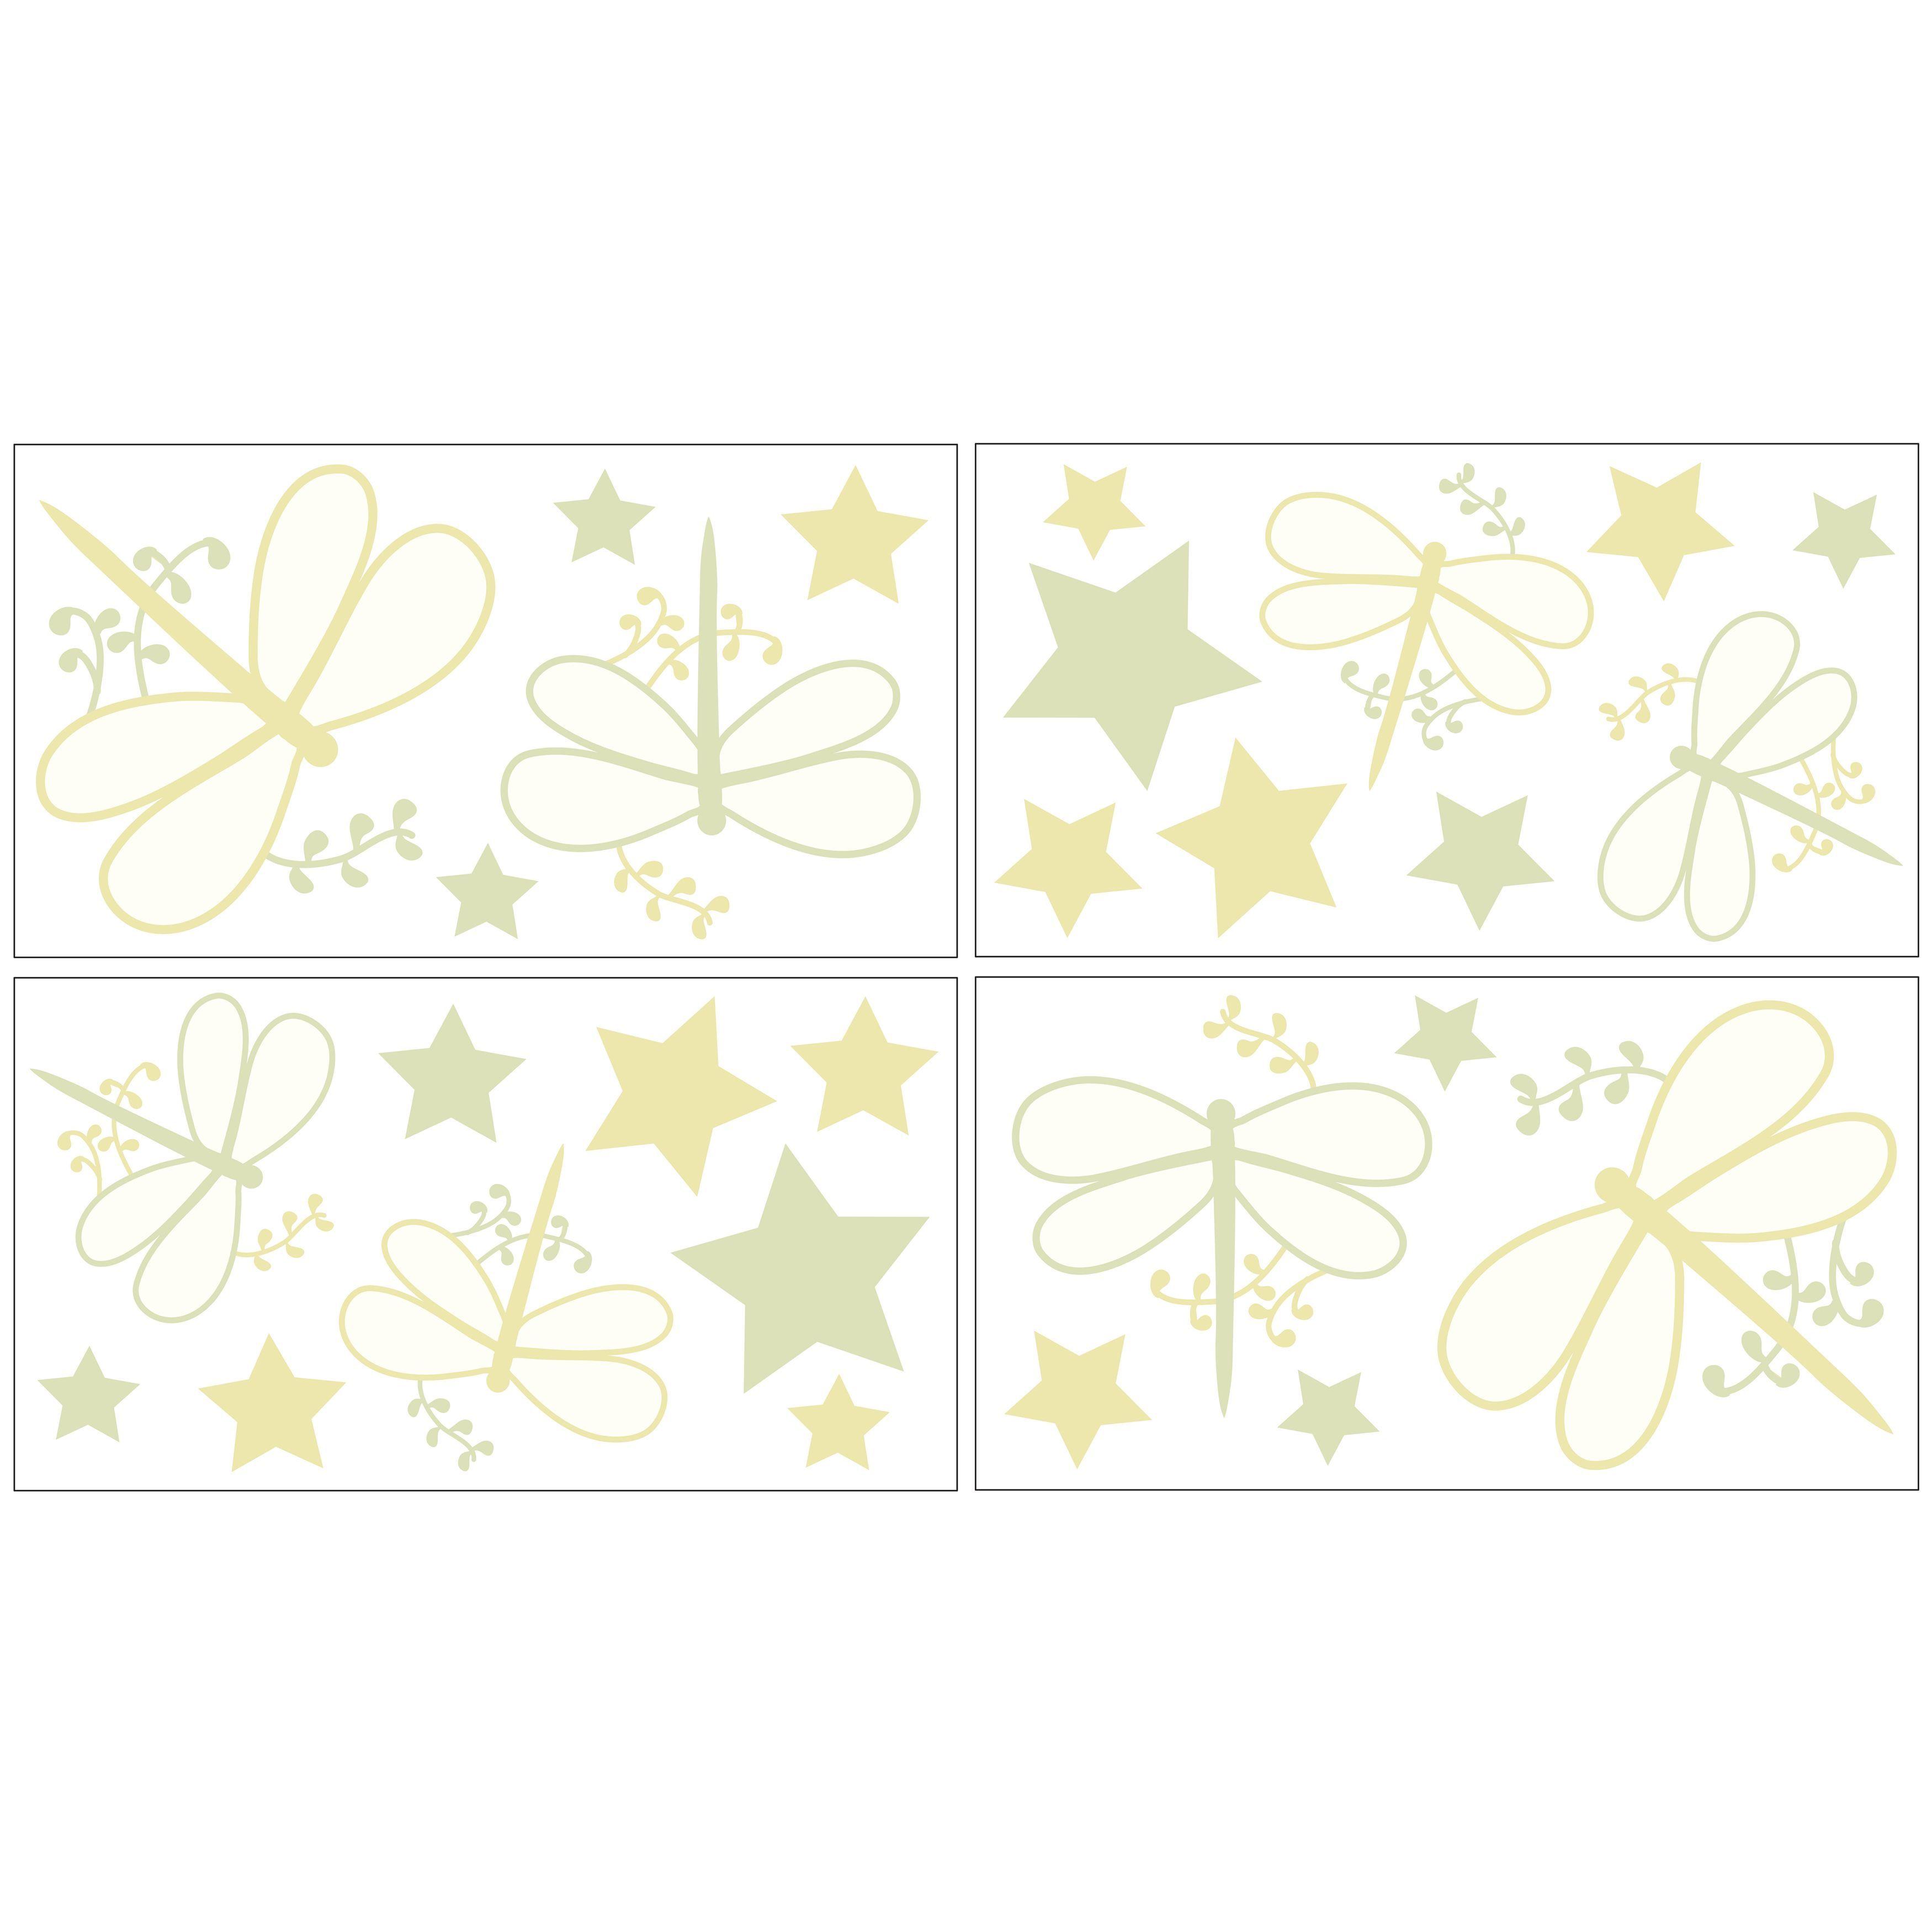 Sweet JoJo Designs Green Dragonfly Dreams Wall Decal Stickers